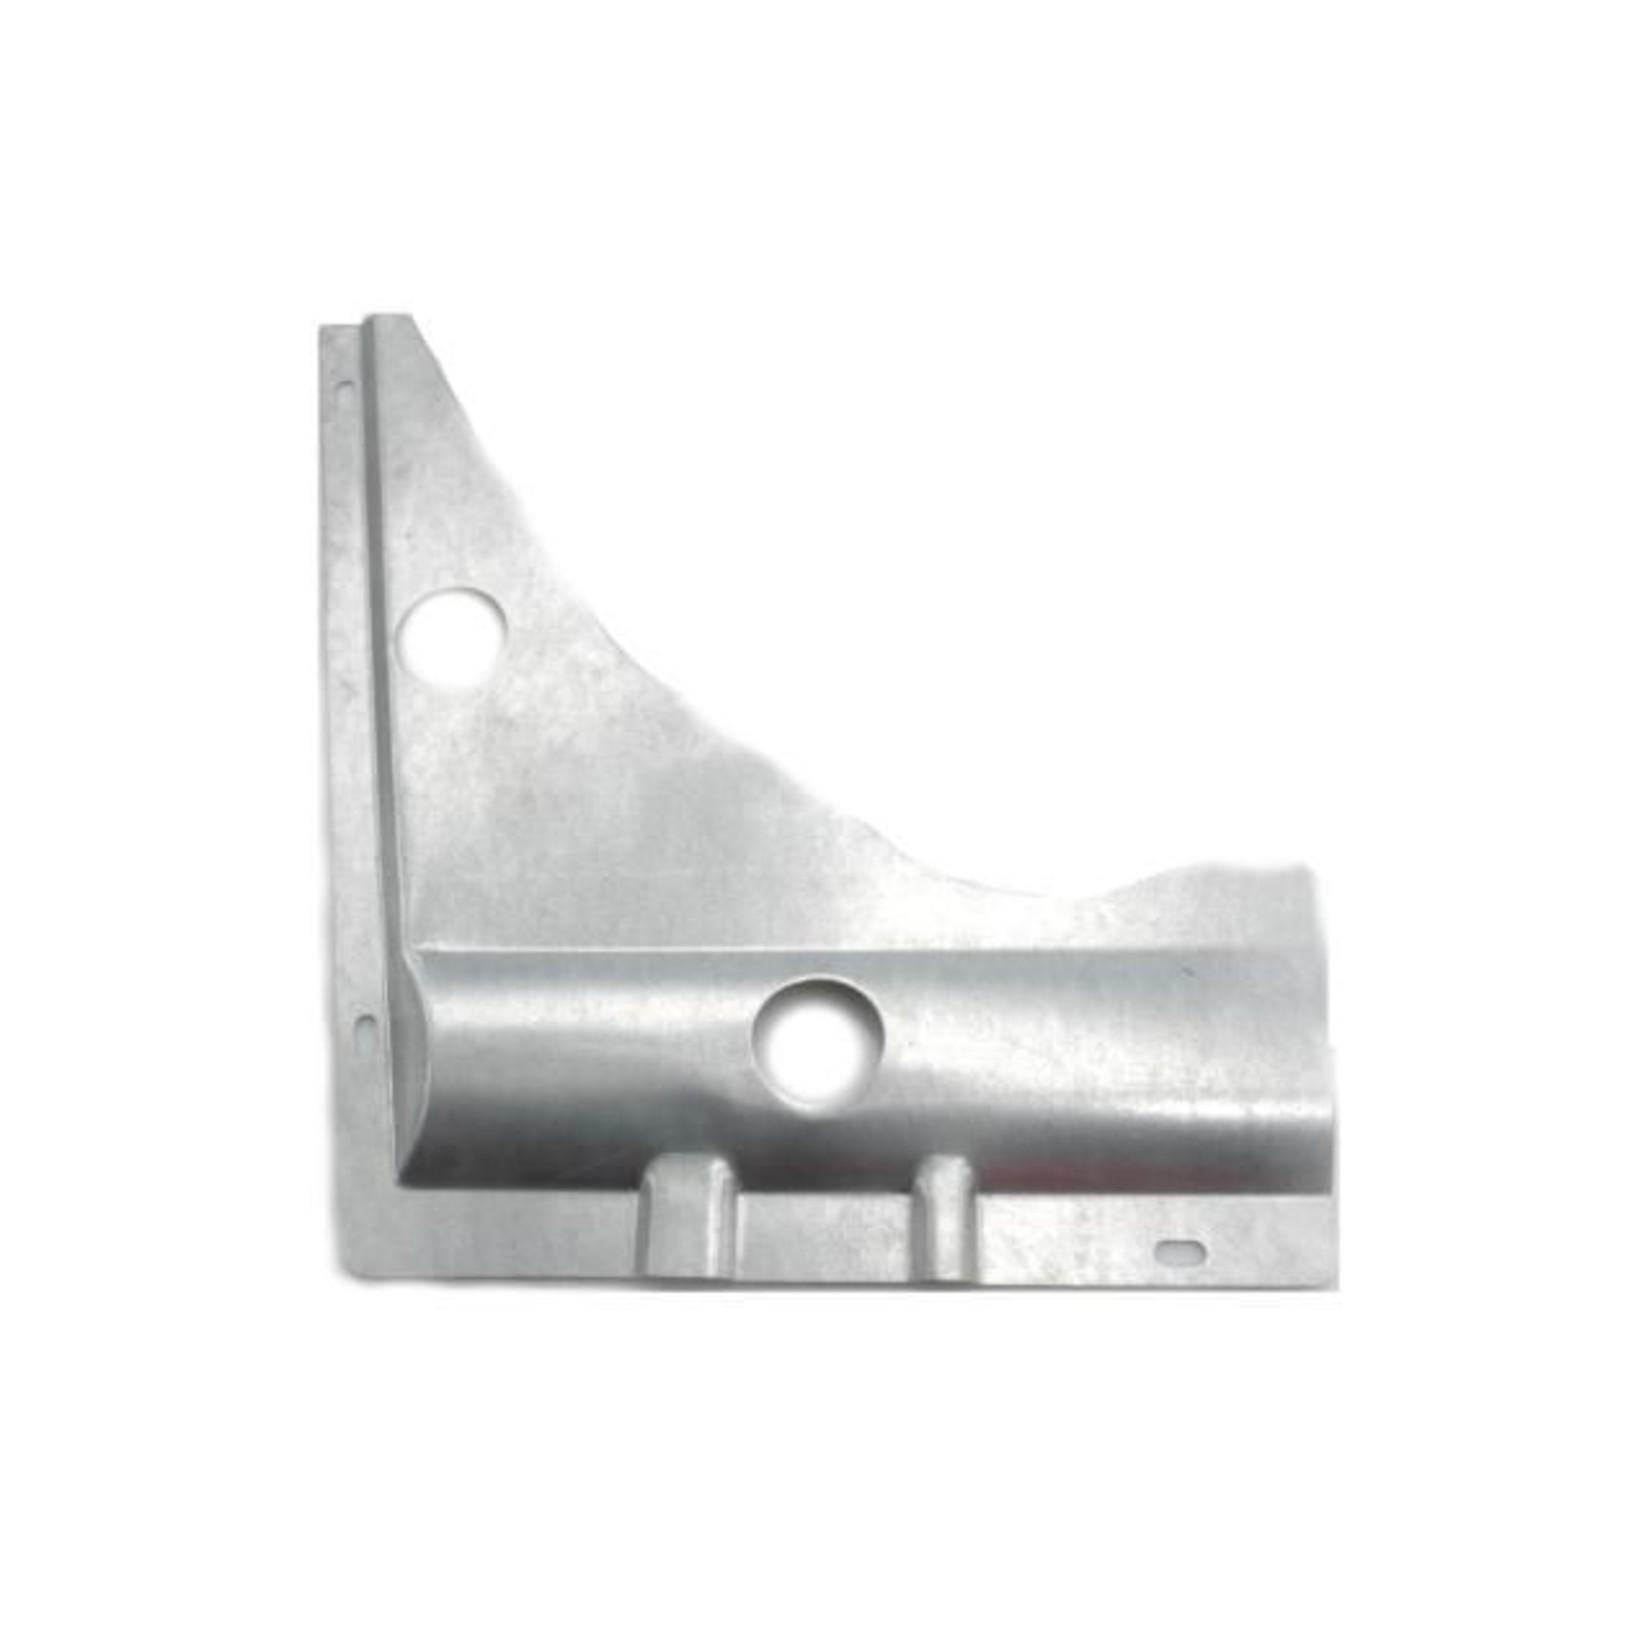 Lower shield inferior half axle left Nr Org: DX434106